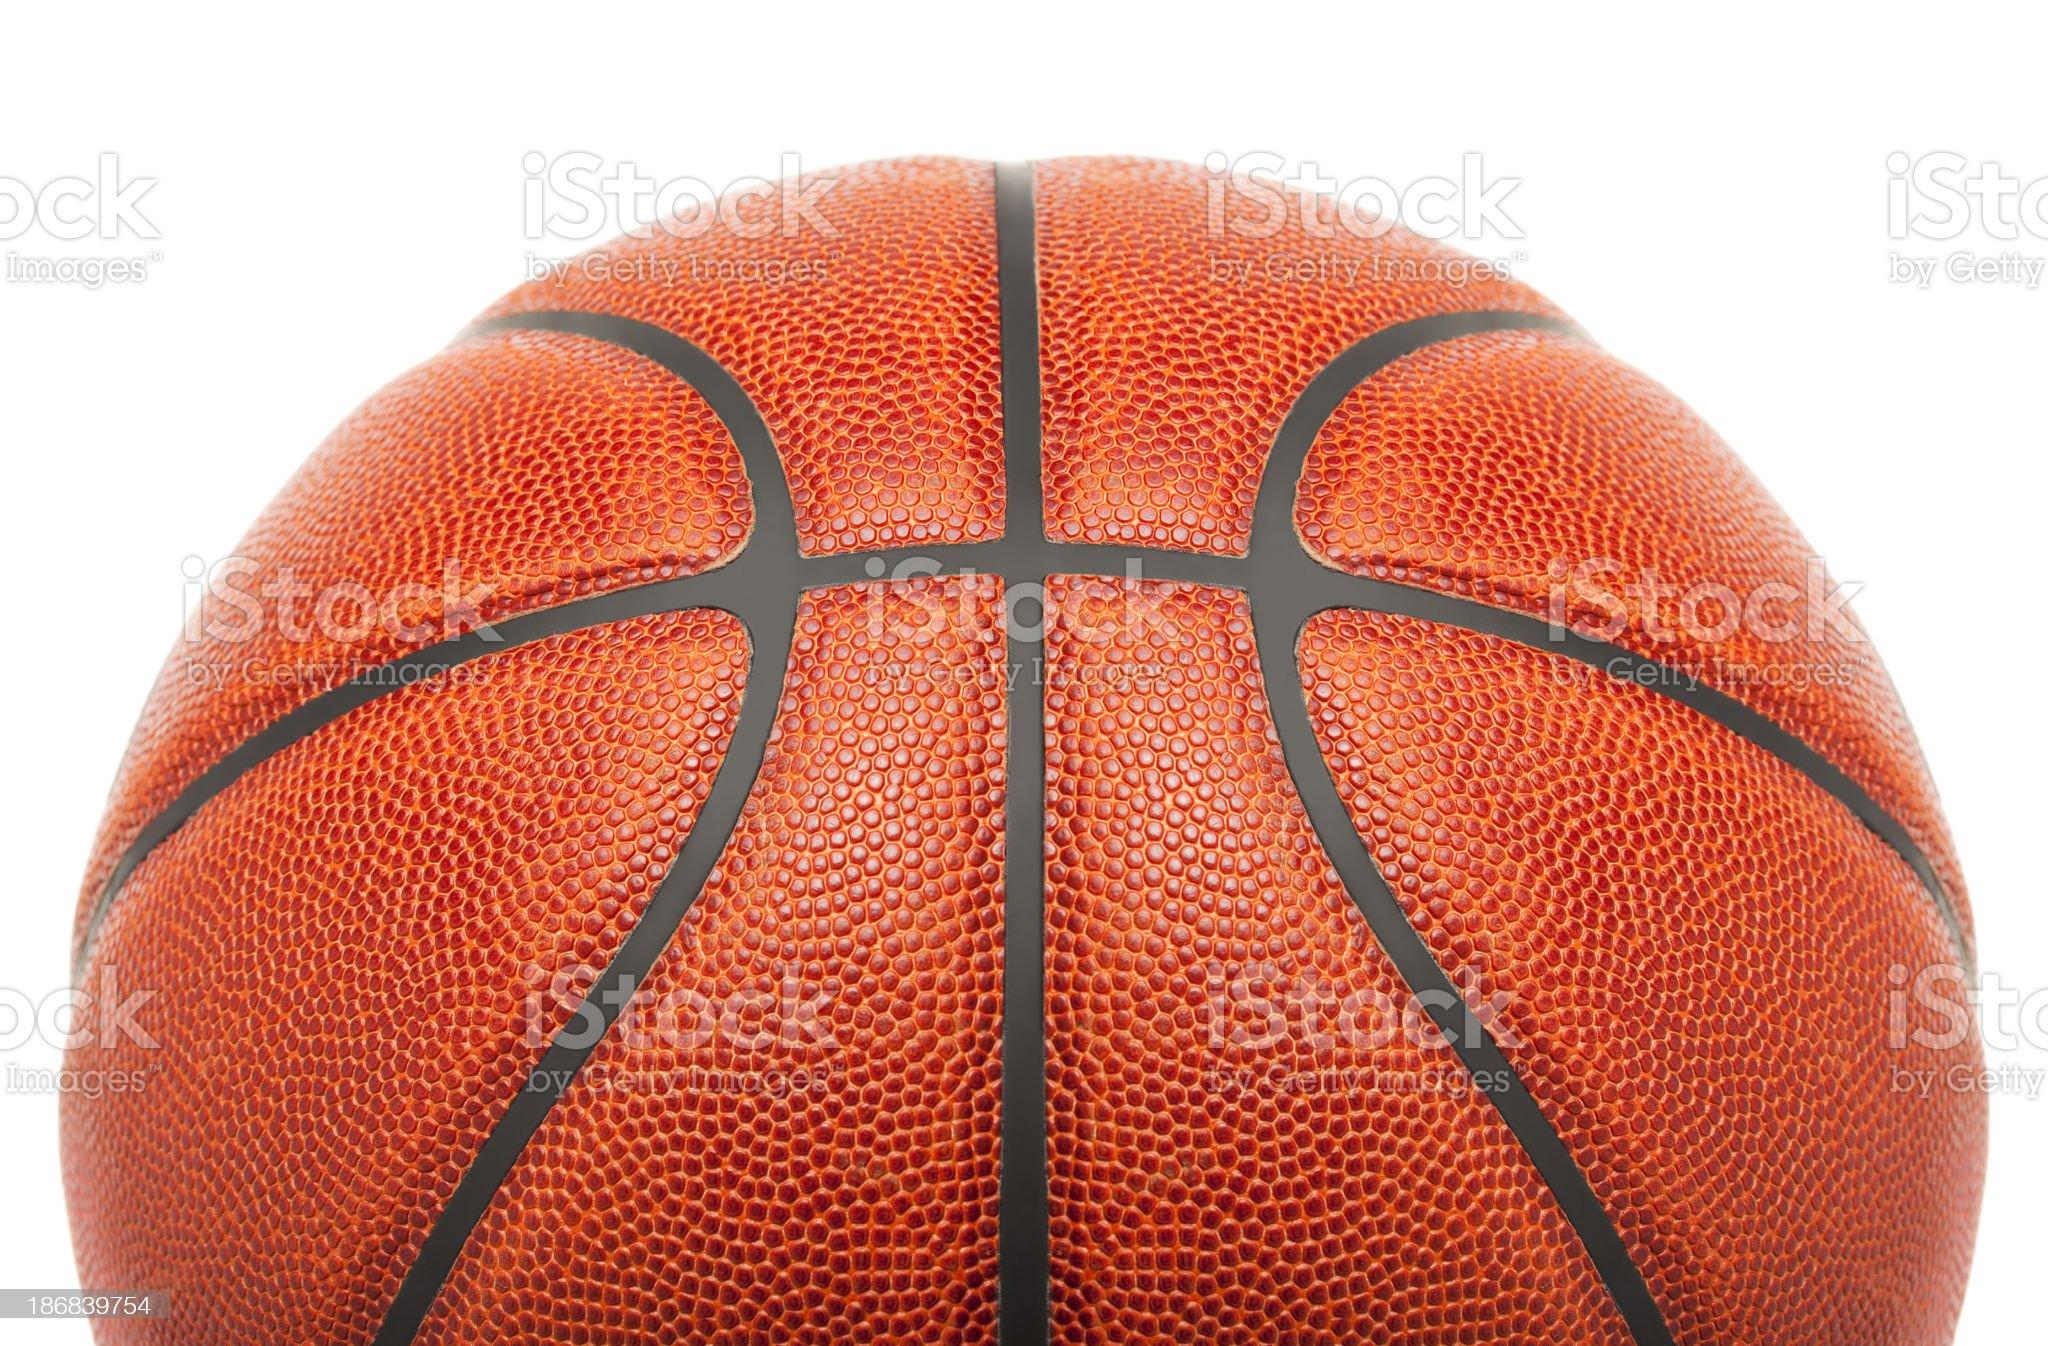 Leather Basketball Isolated on White royalty-free stock photo